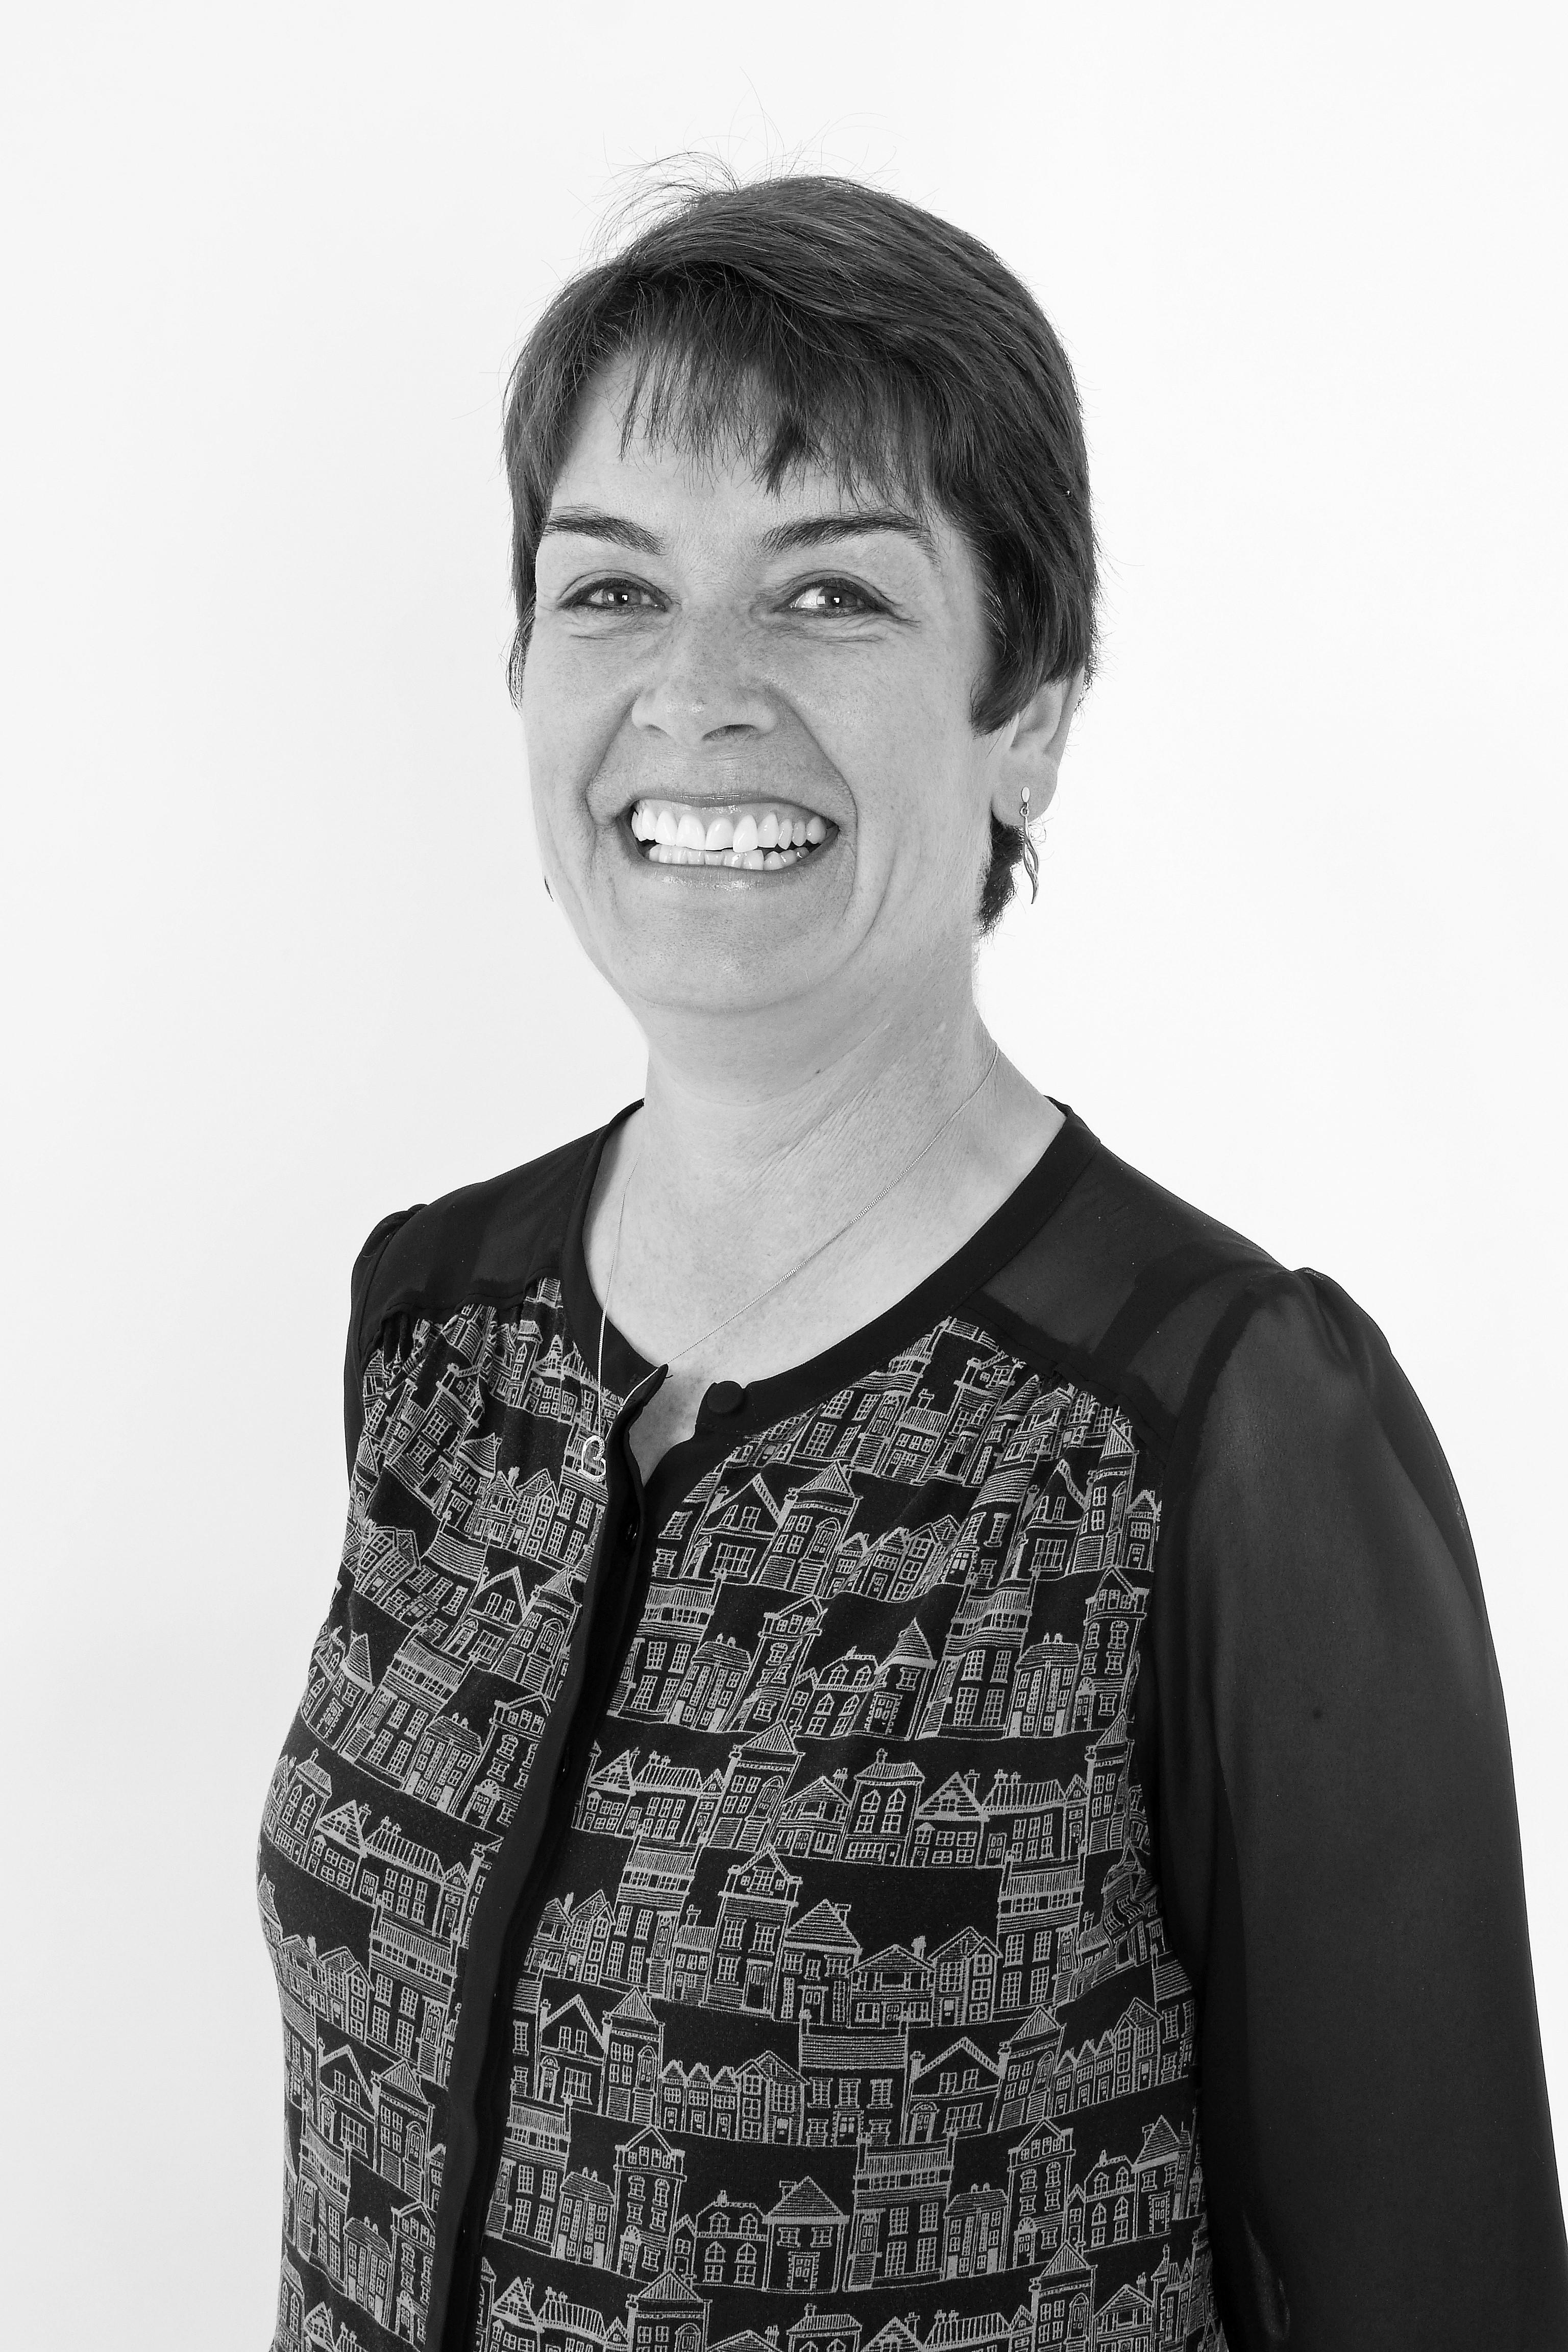 Liza Straughan